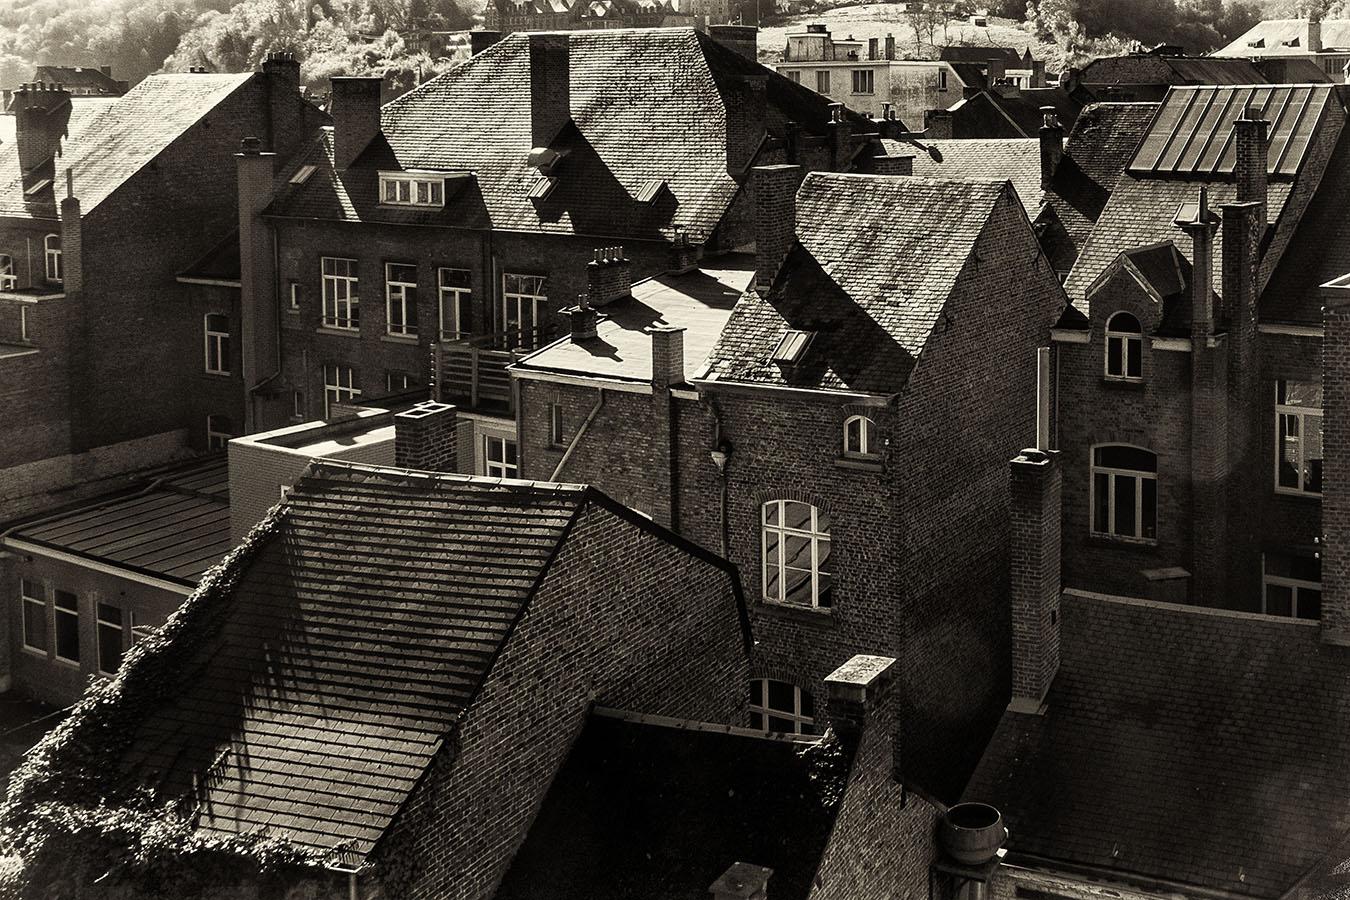 Houses of Dinant, Belgium, Autumn 2012.